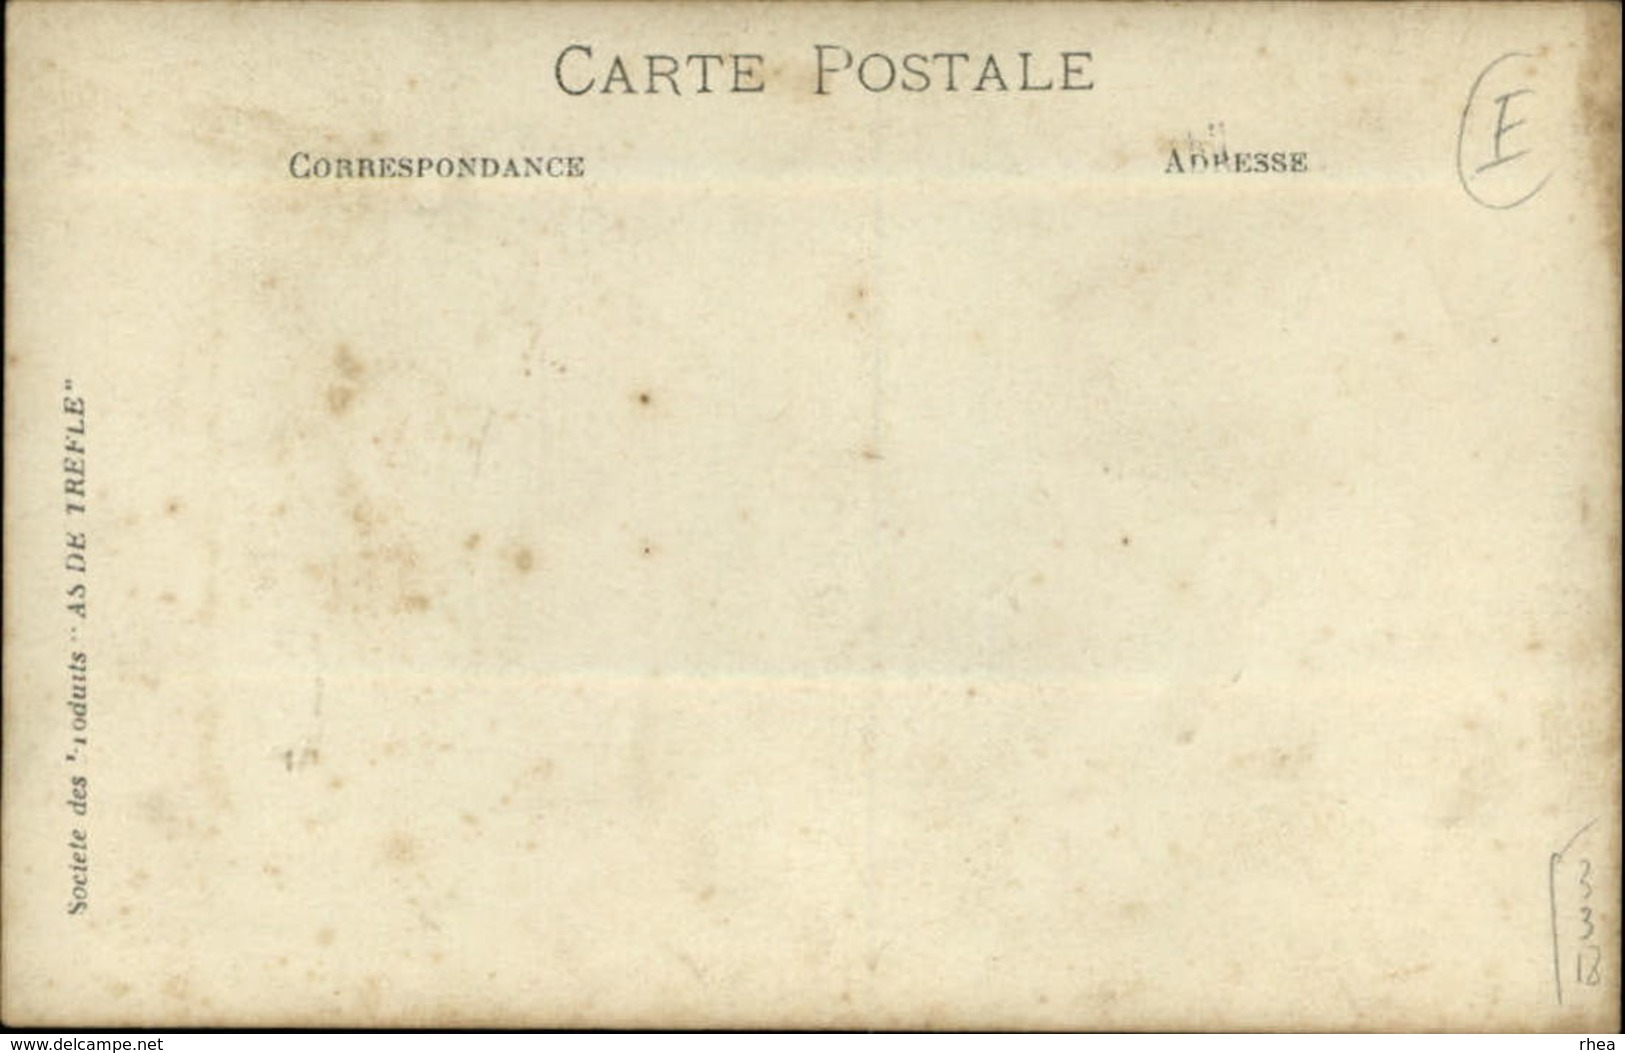 CARTE PHOTO à LOCALISER - Café - Jeu De Cartes - Cartes Postales